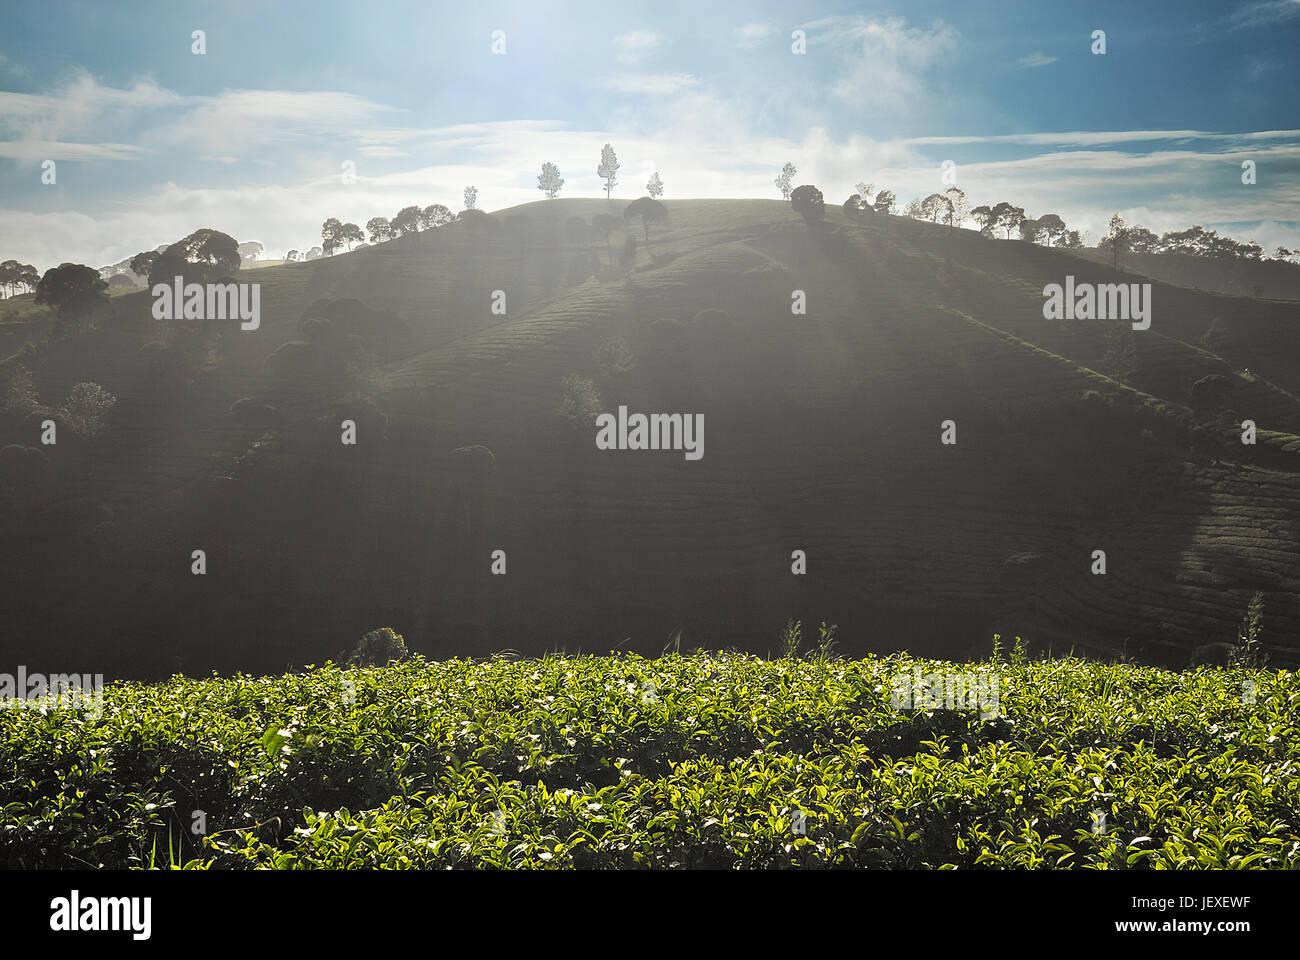 Tea Plantantion Mornings Glory - Stock Image